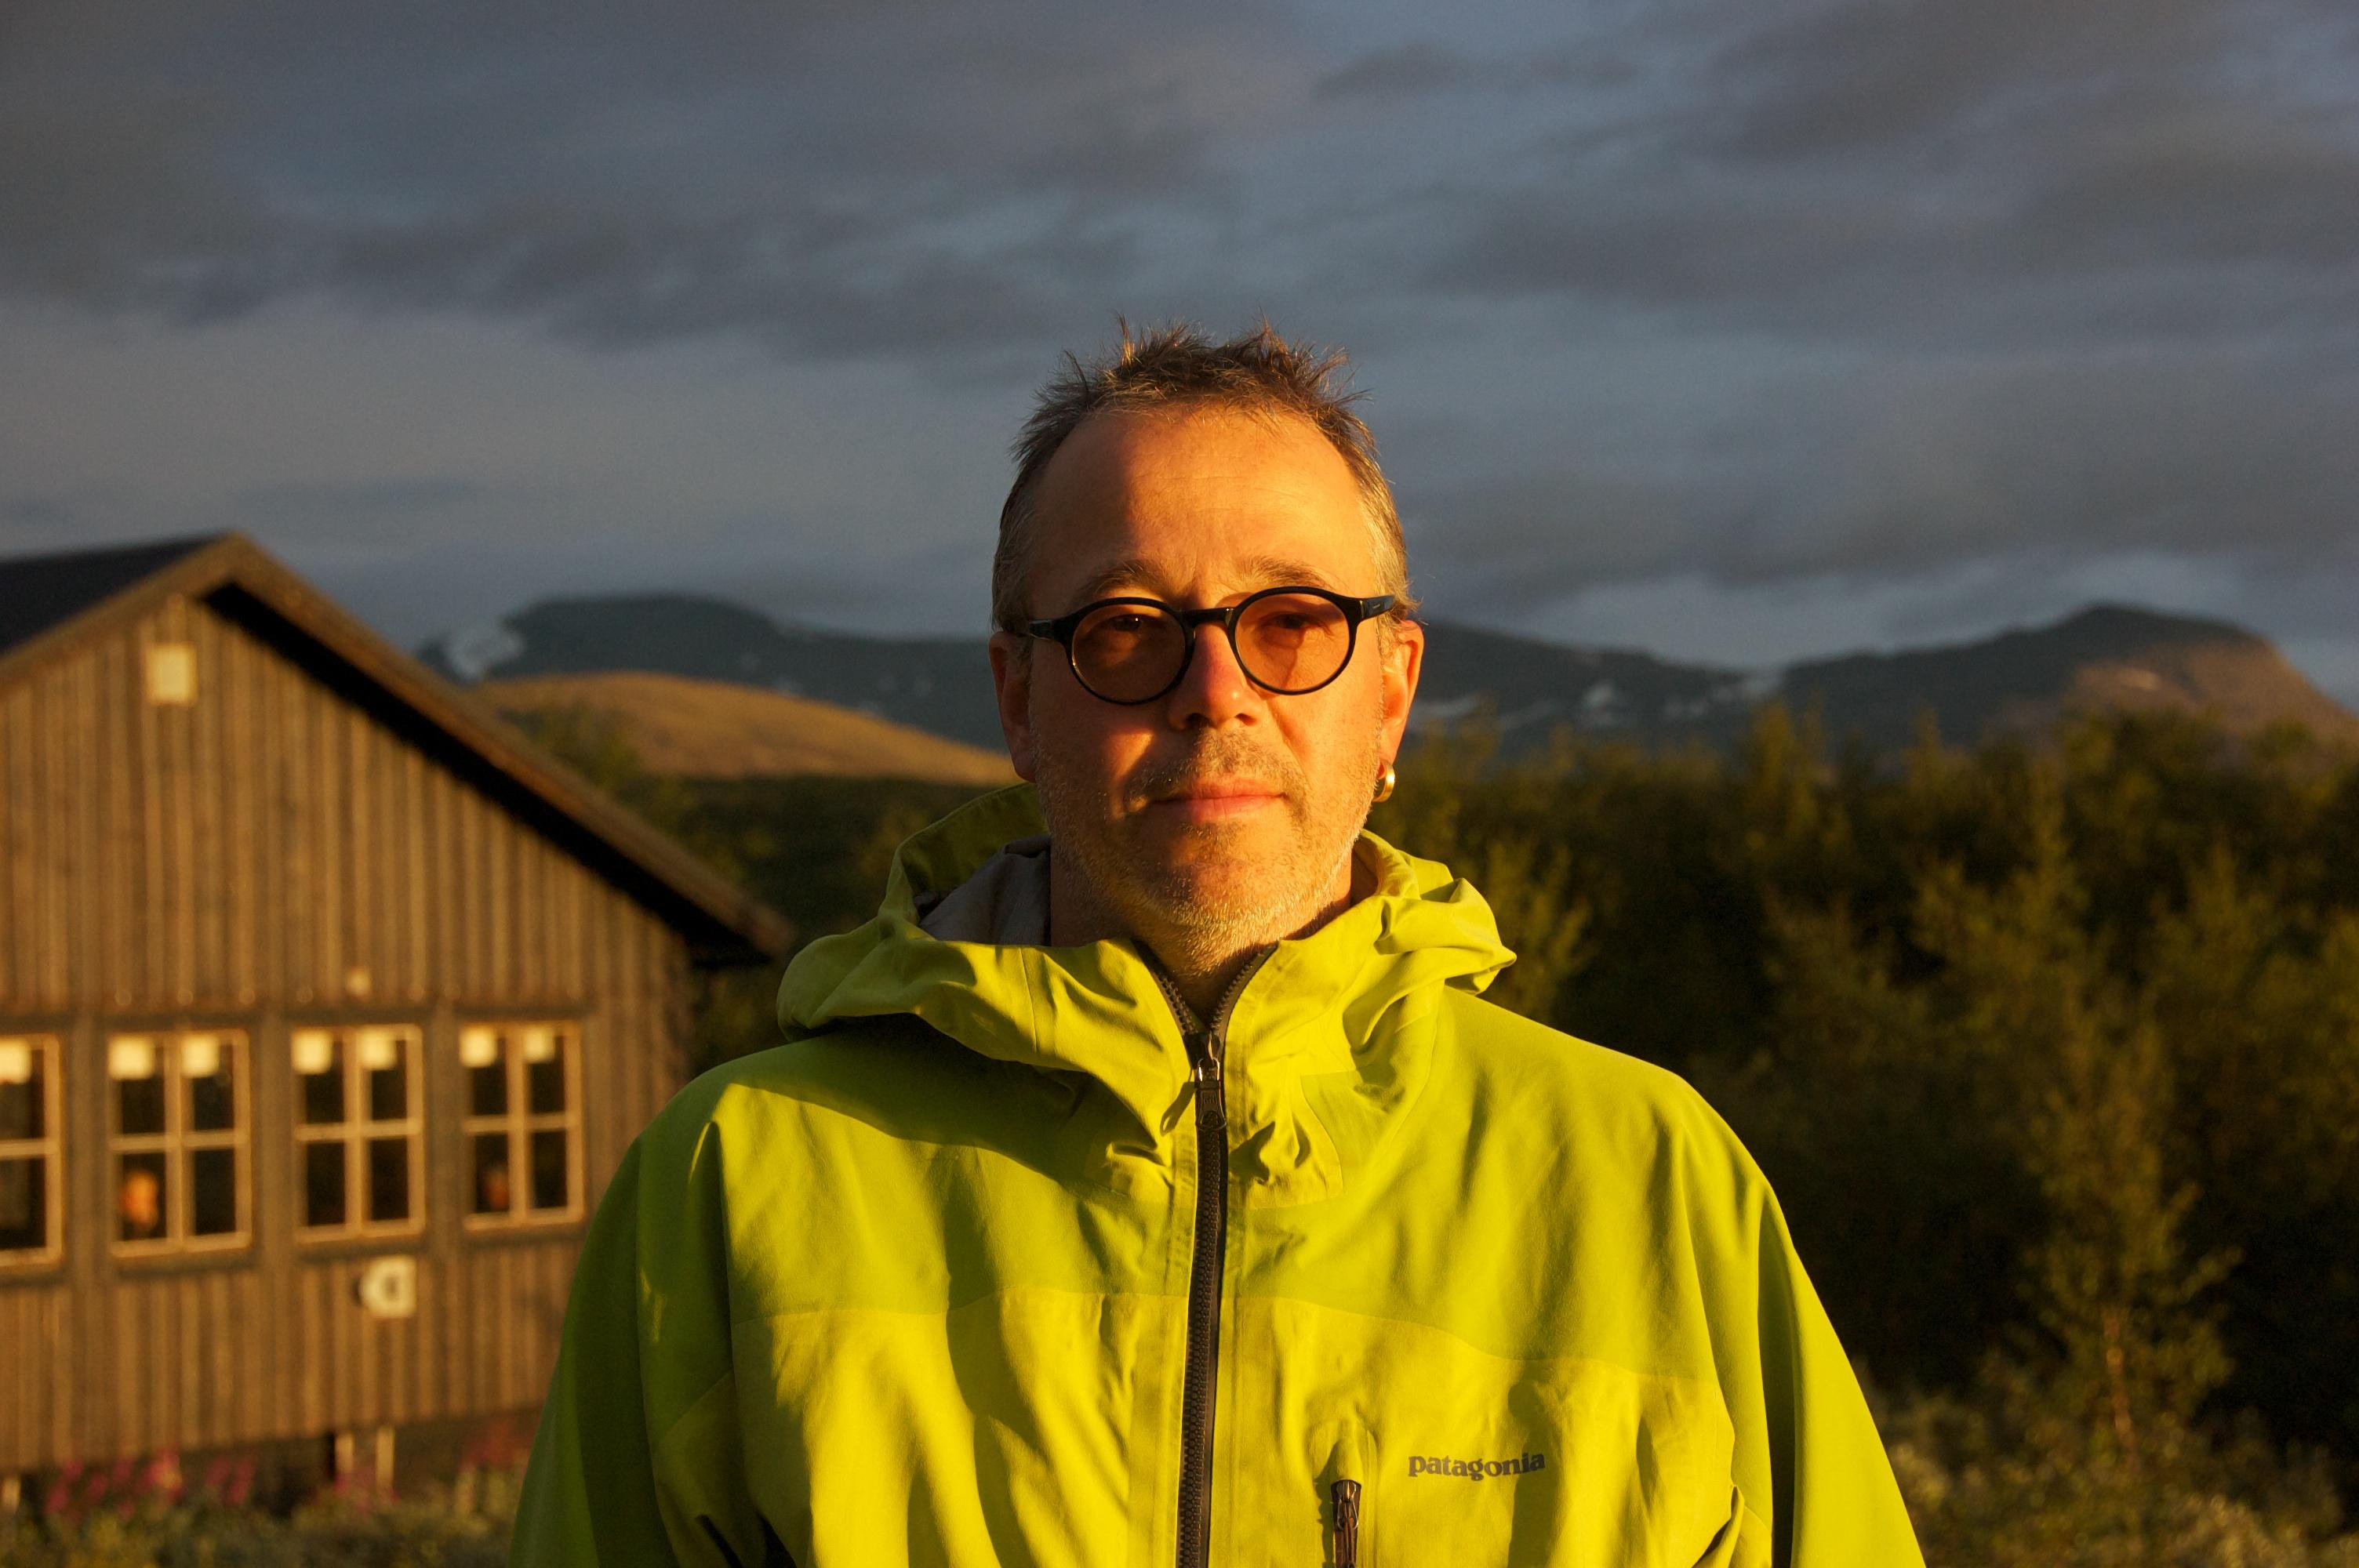 Peter Antman framför STF:s stuga i Stalloluokta